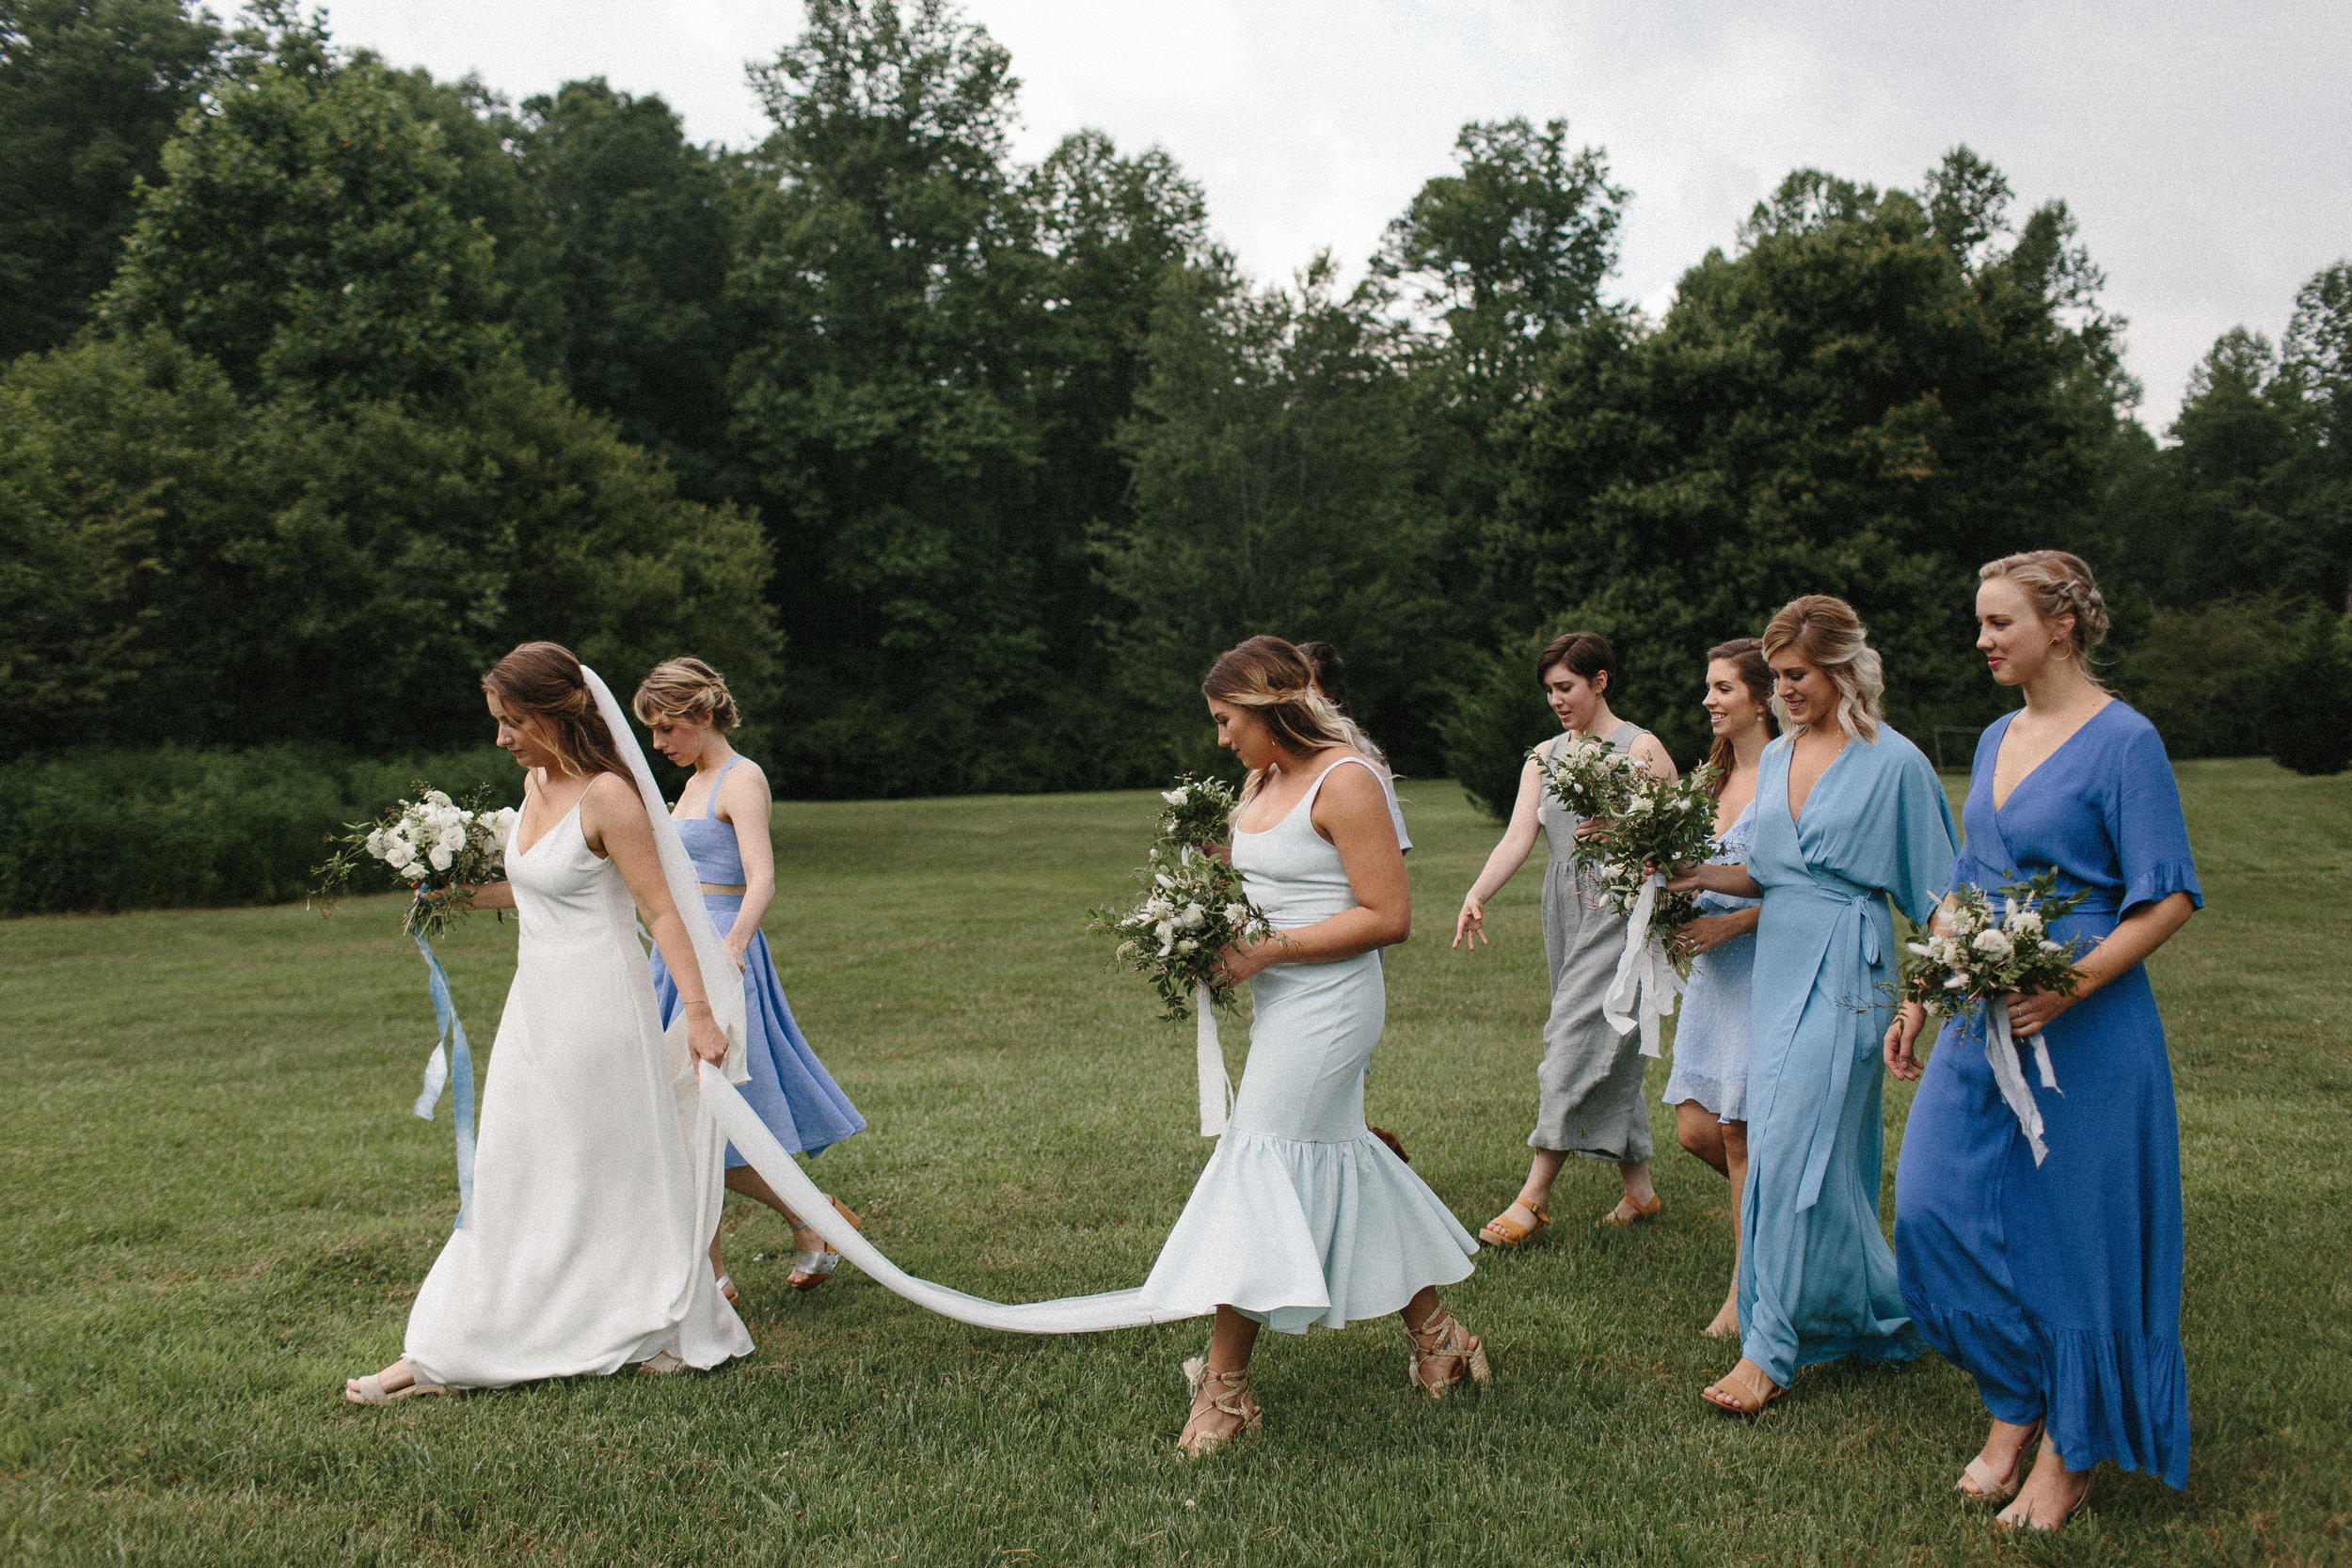 glen_ella_meadow_creekside_atlanta_wedding_photographers_1245.jpg